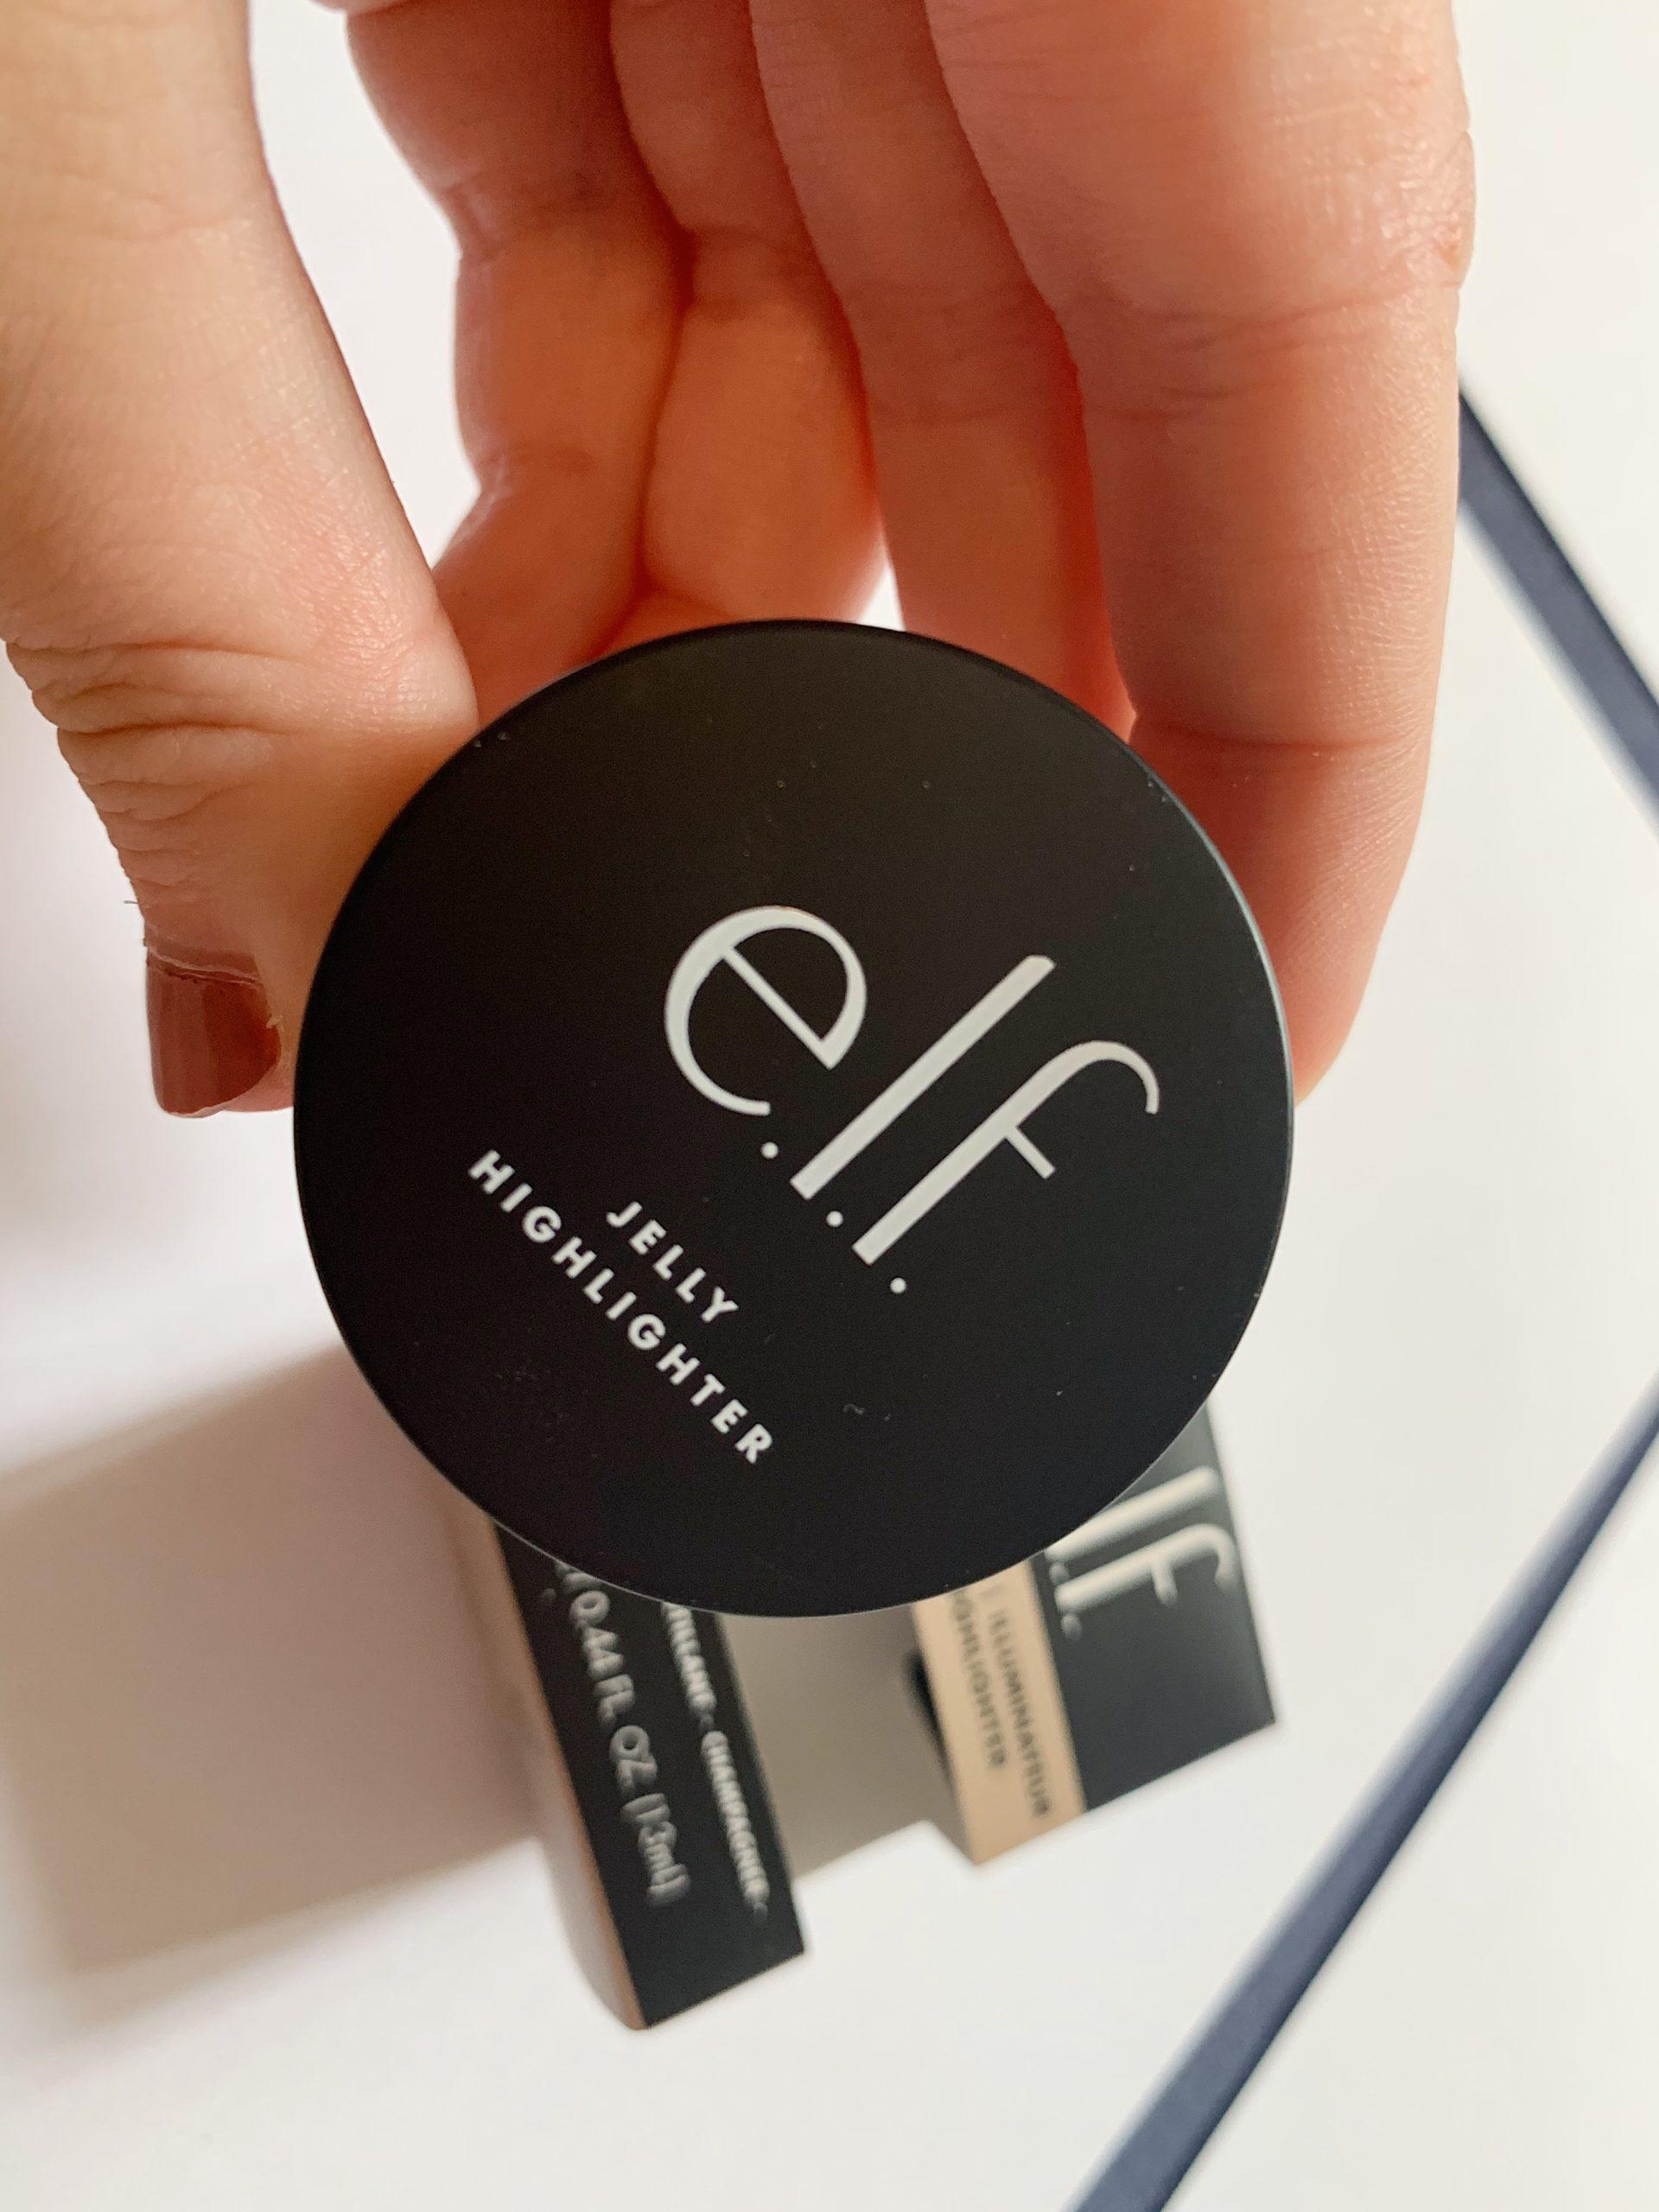 ELF Cosmetics jelly highlighter